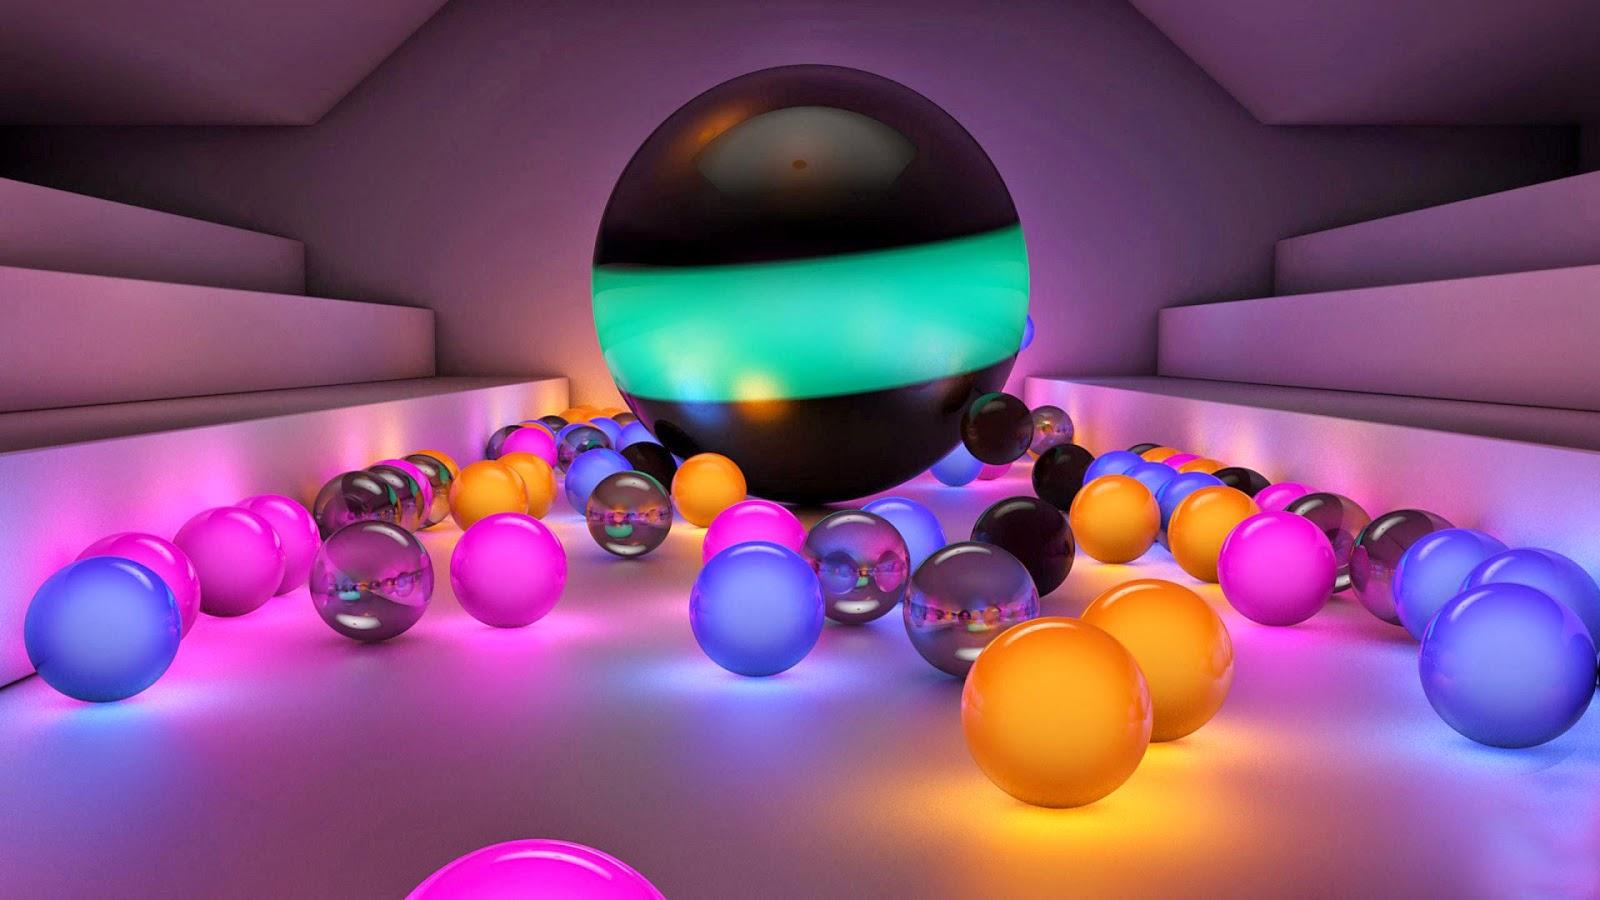 3D colorful balls hd wallpaper free